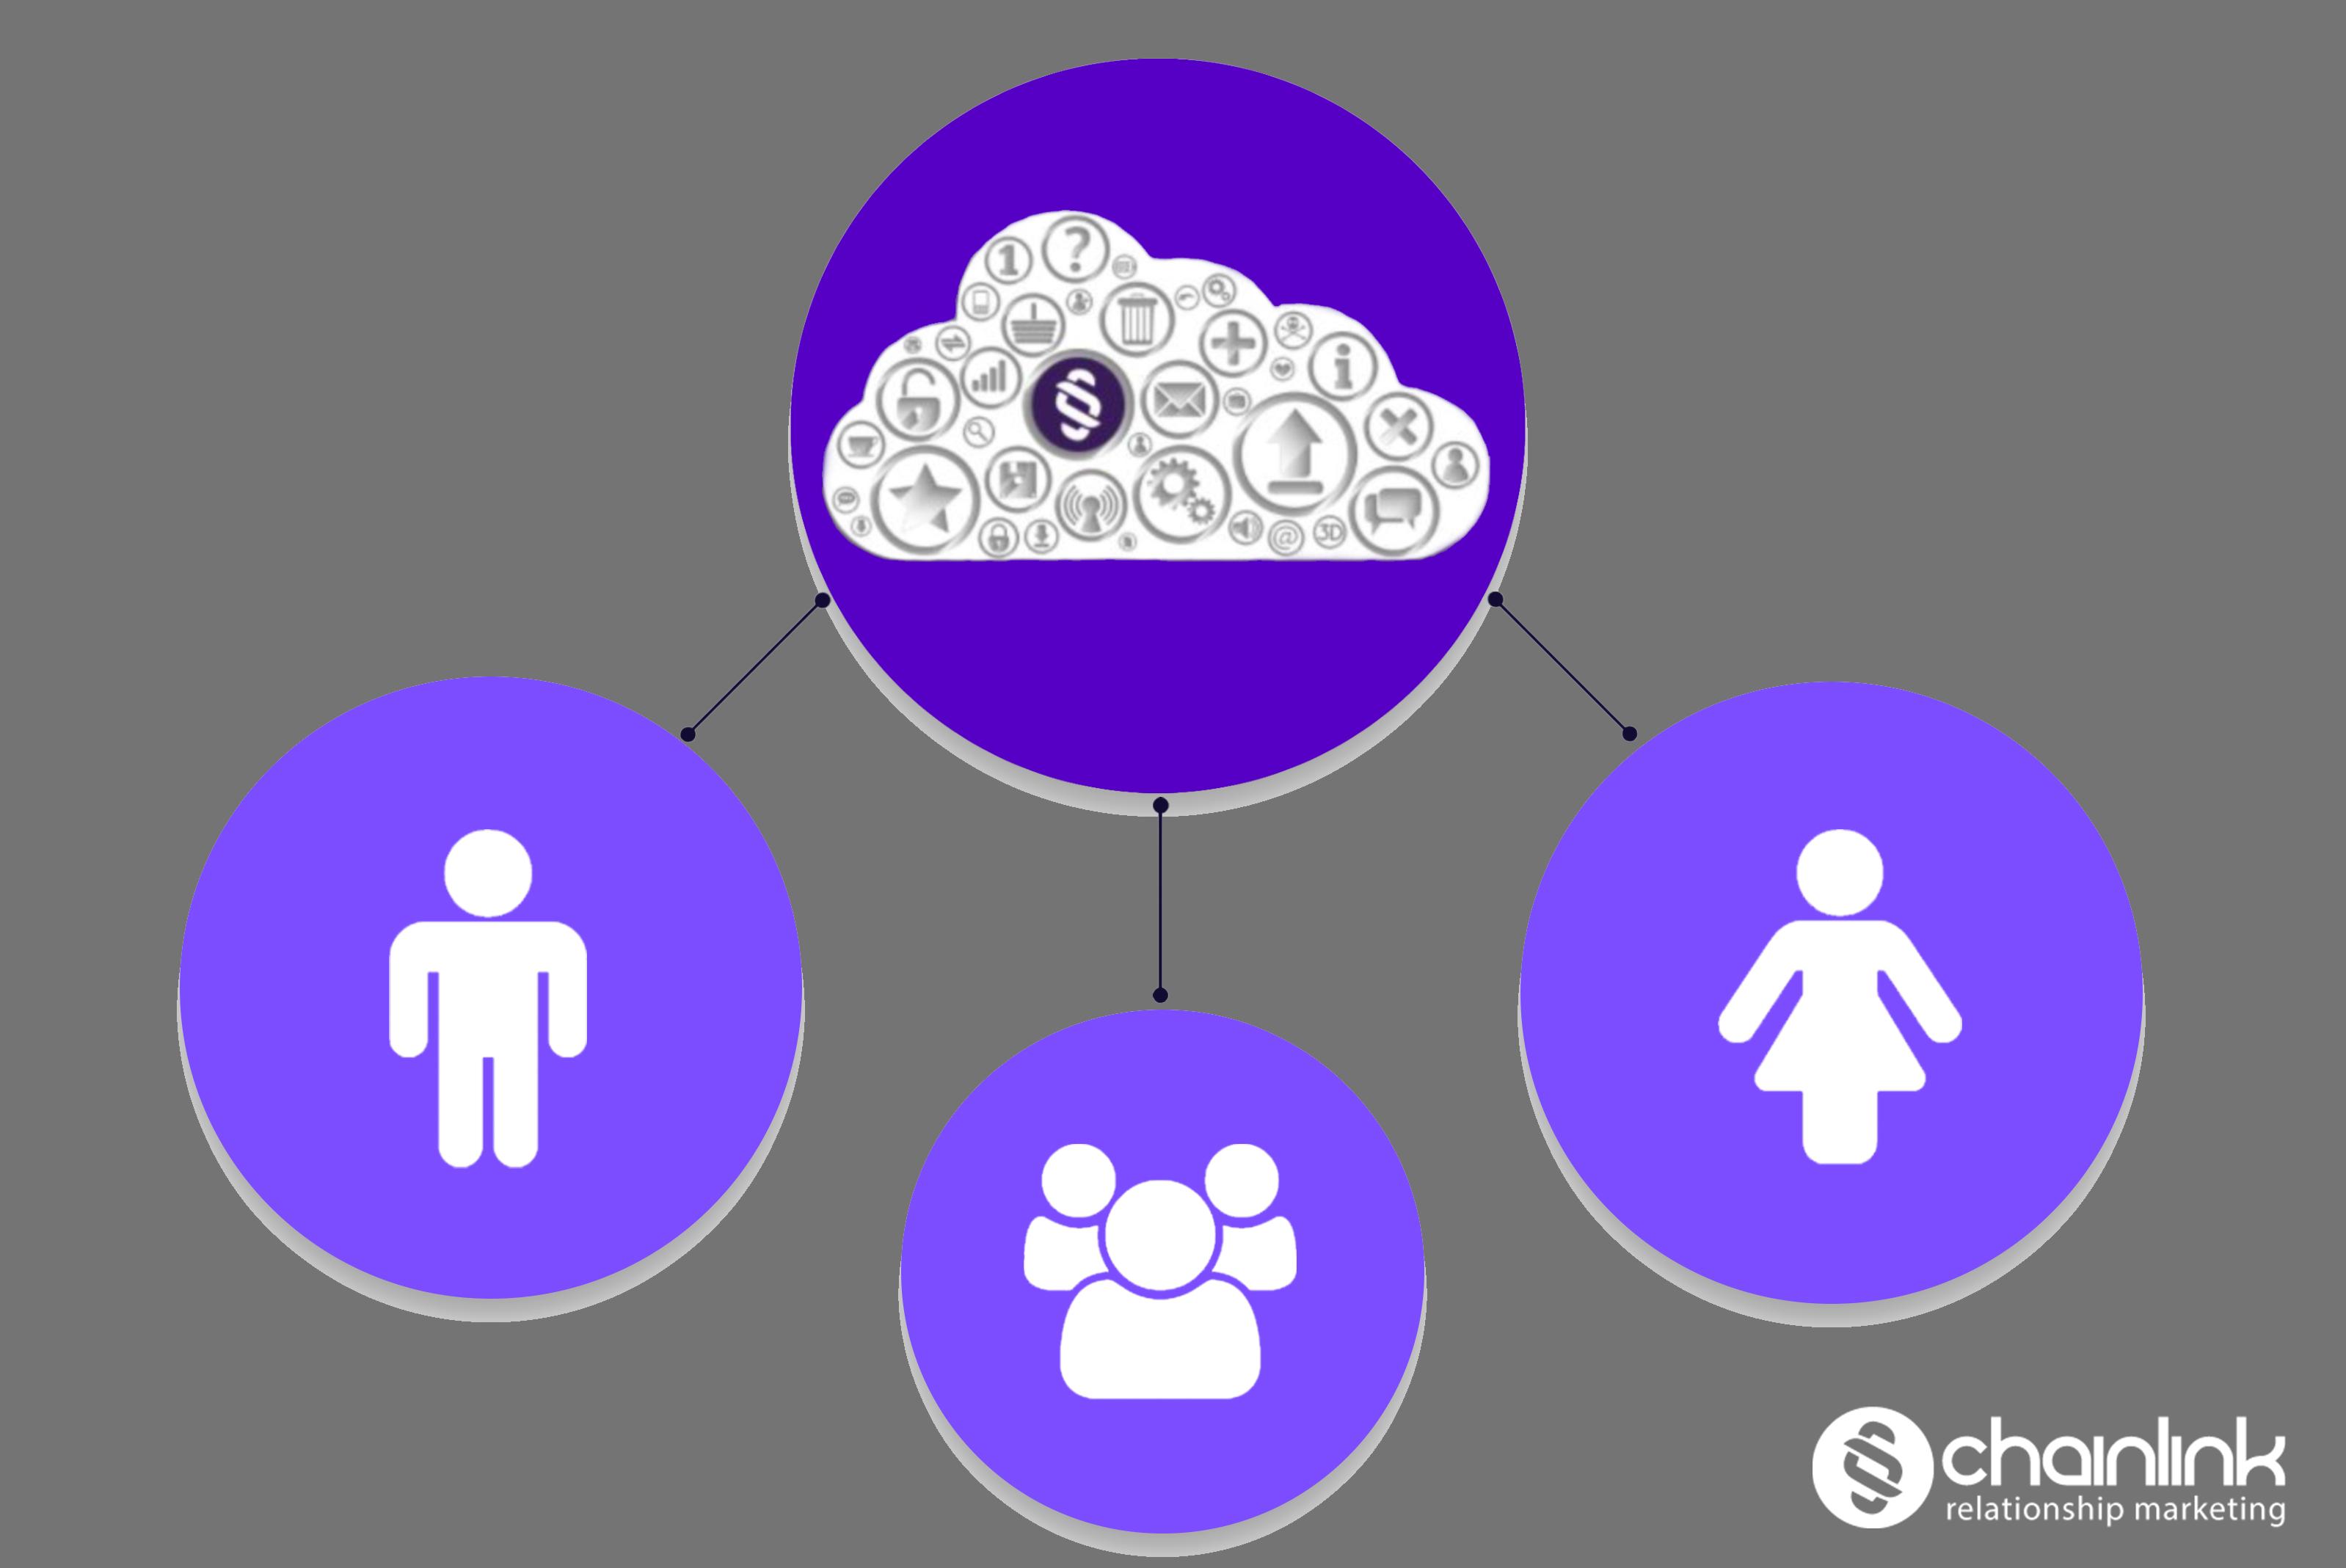 content marketing - Chainlink Relationship Marketing